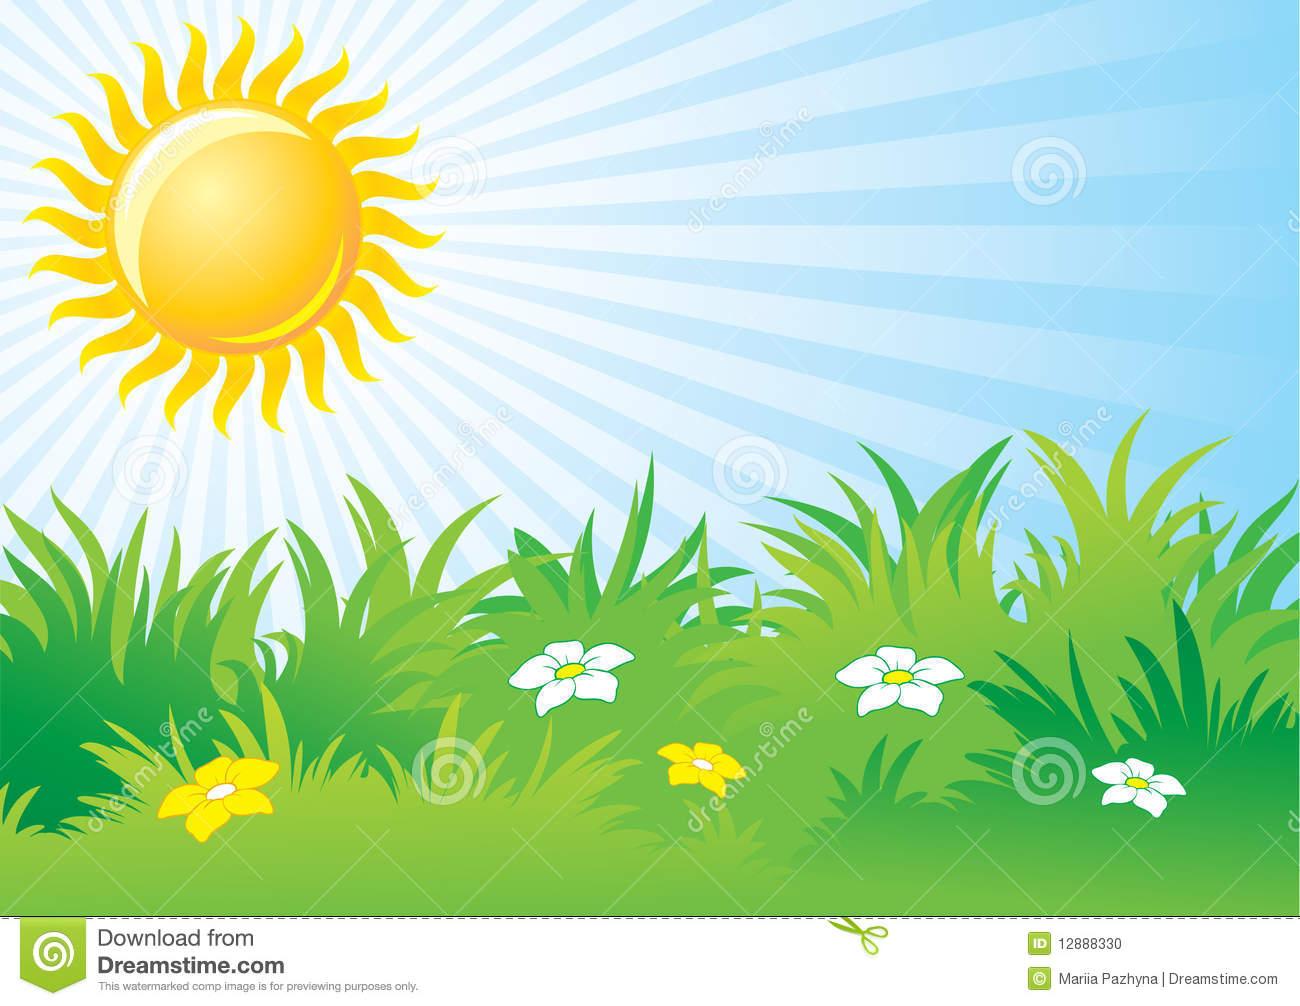 Bright Sunny Day Clipart-Bright Sunny Day Clipart-0